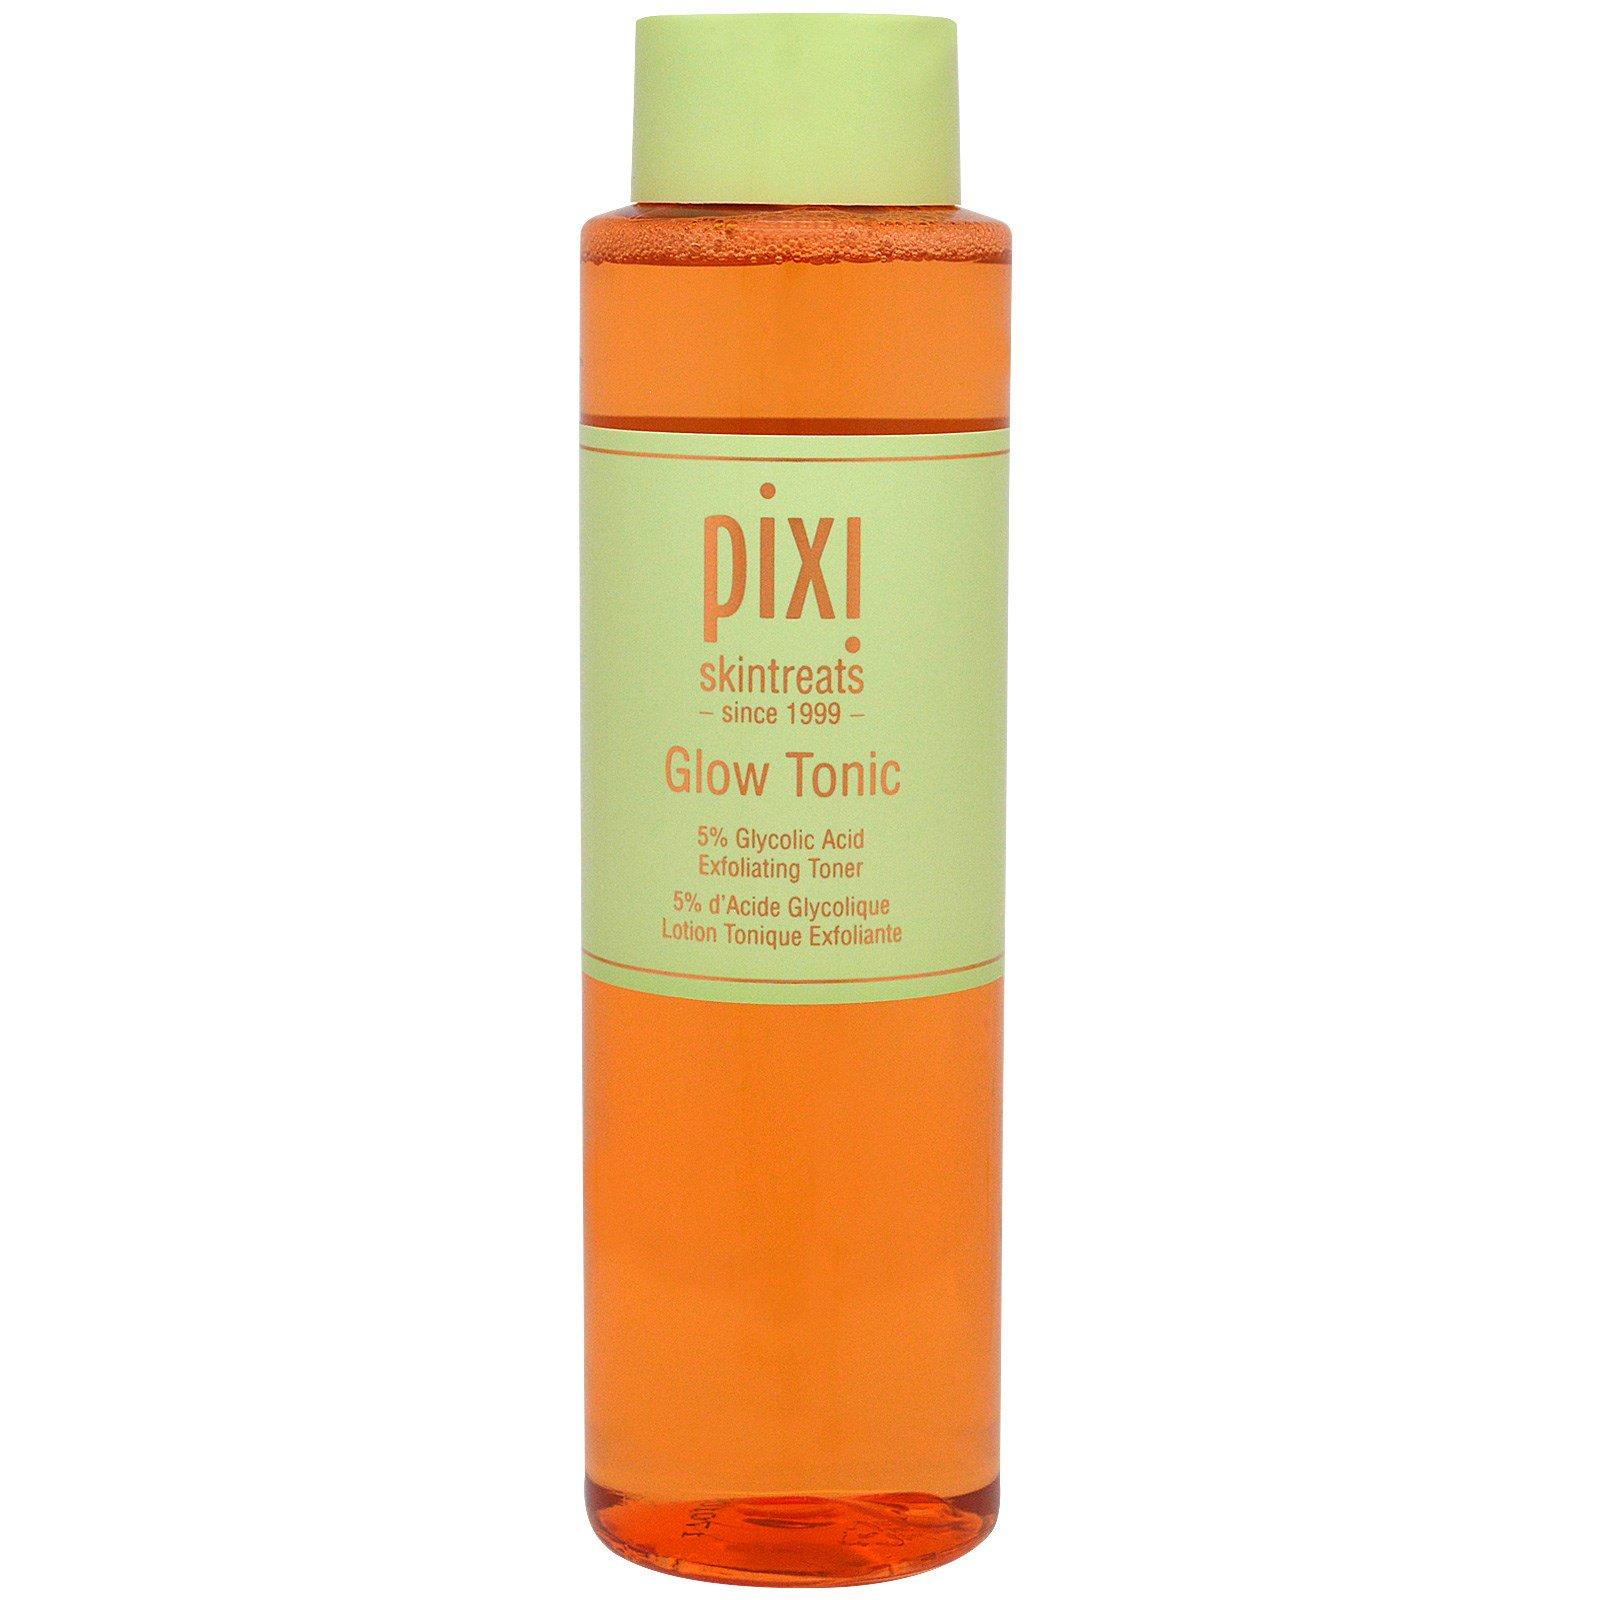 Pixi Beauty, Тоник для сверкающей кожи, Отшелушивающий тоник, 8,5 унций (250 мл)